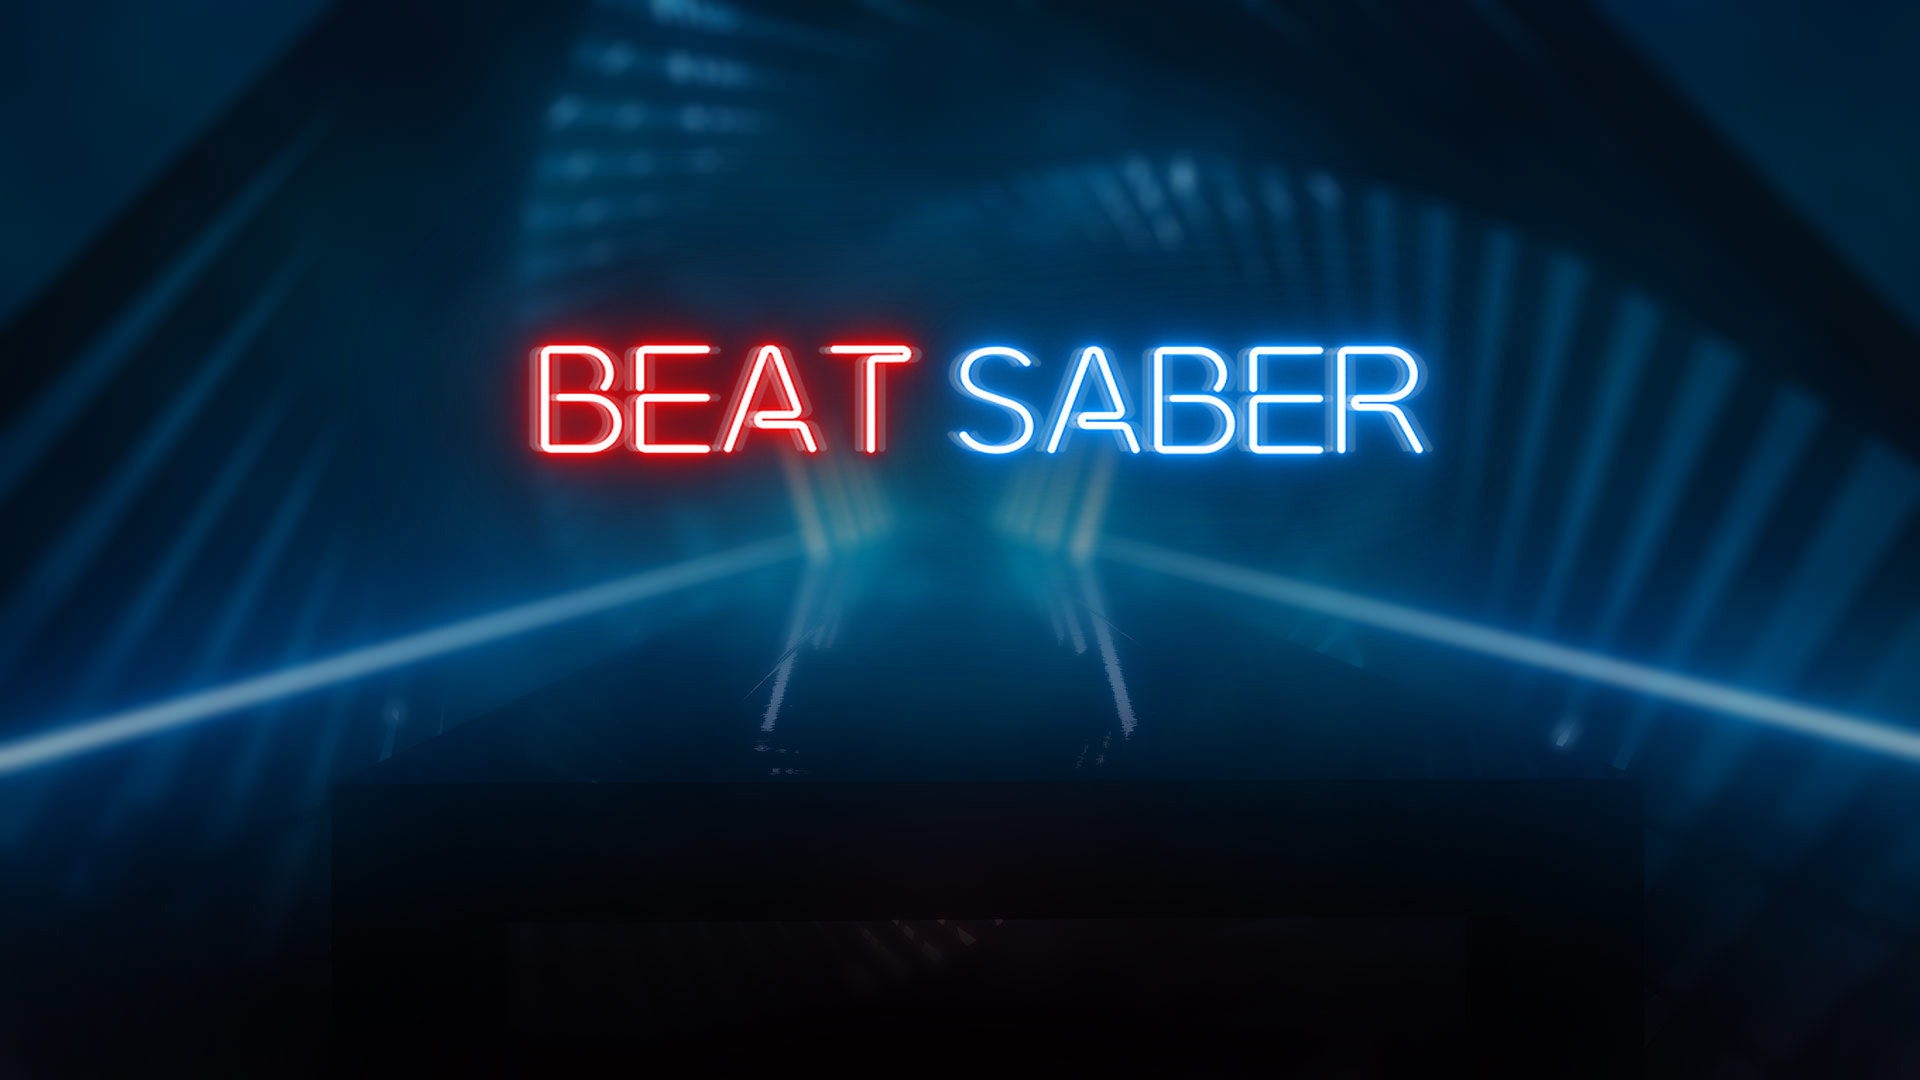 28+] Beat Saber Wallpapers on WallpaperSafari